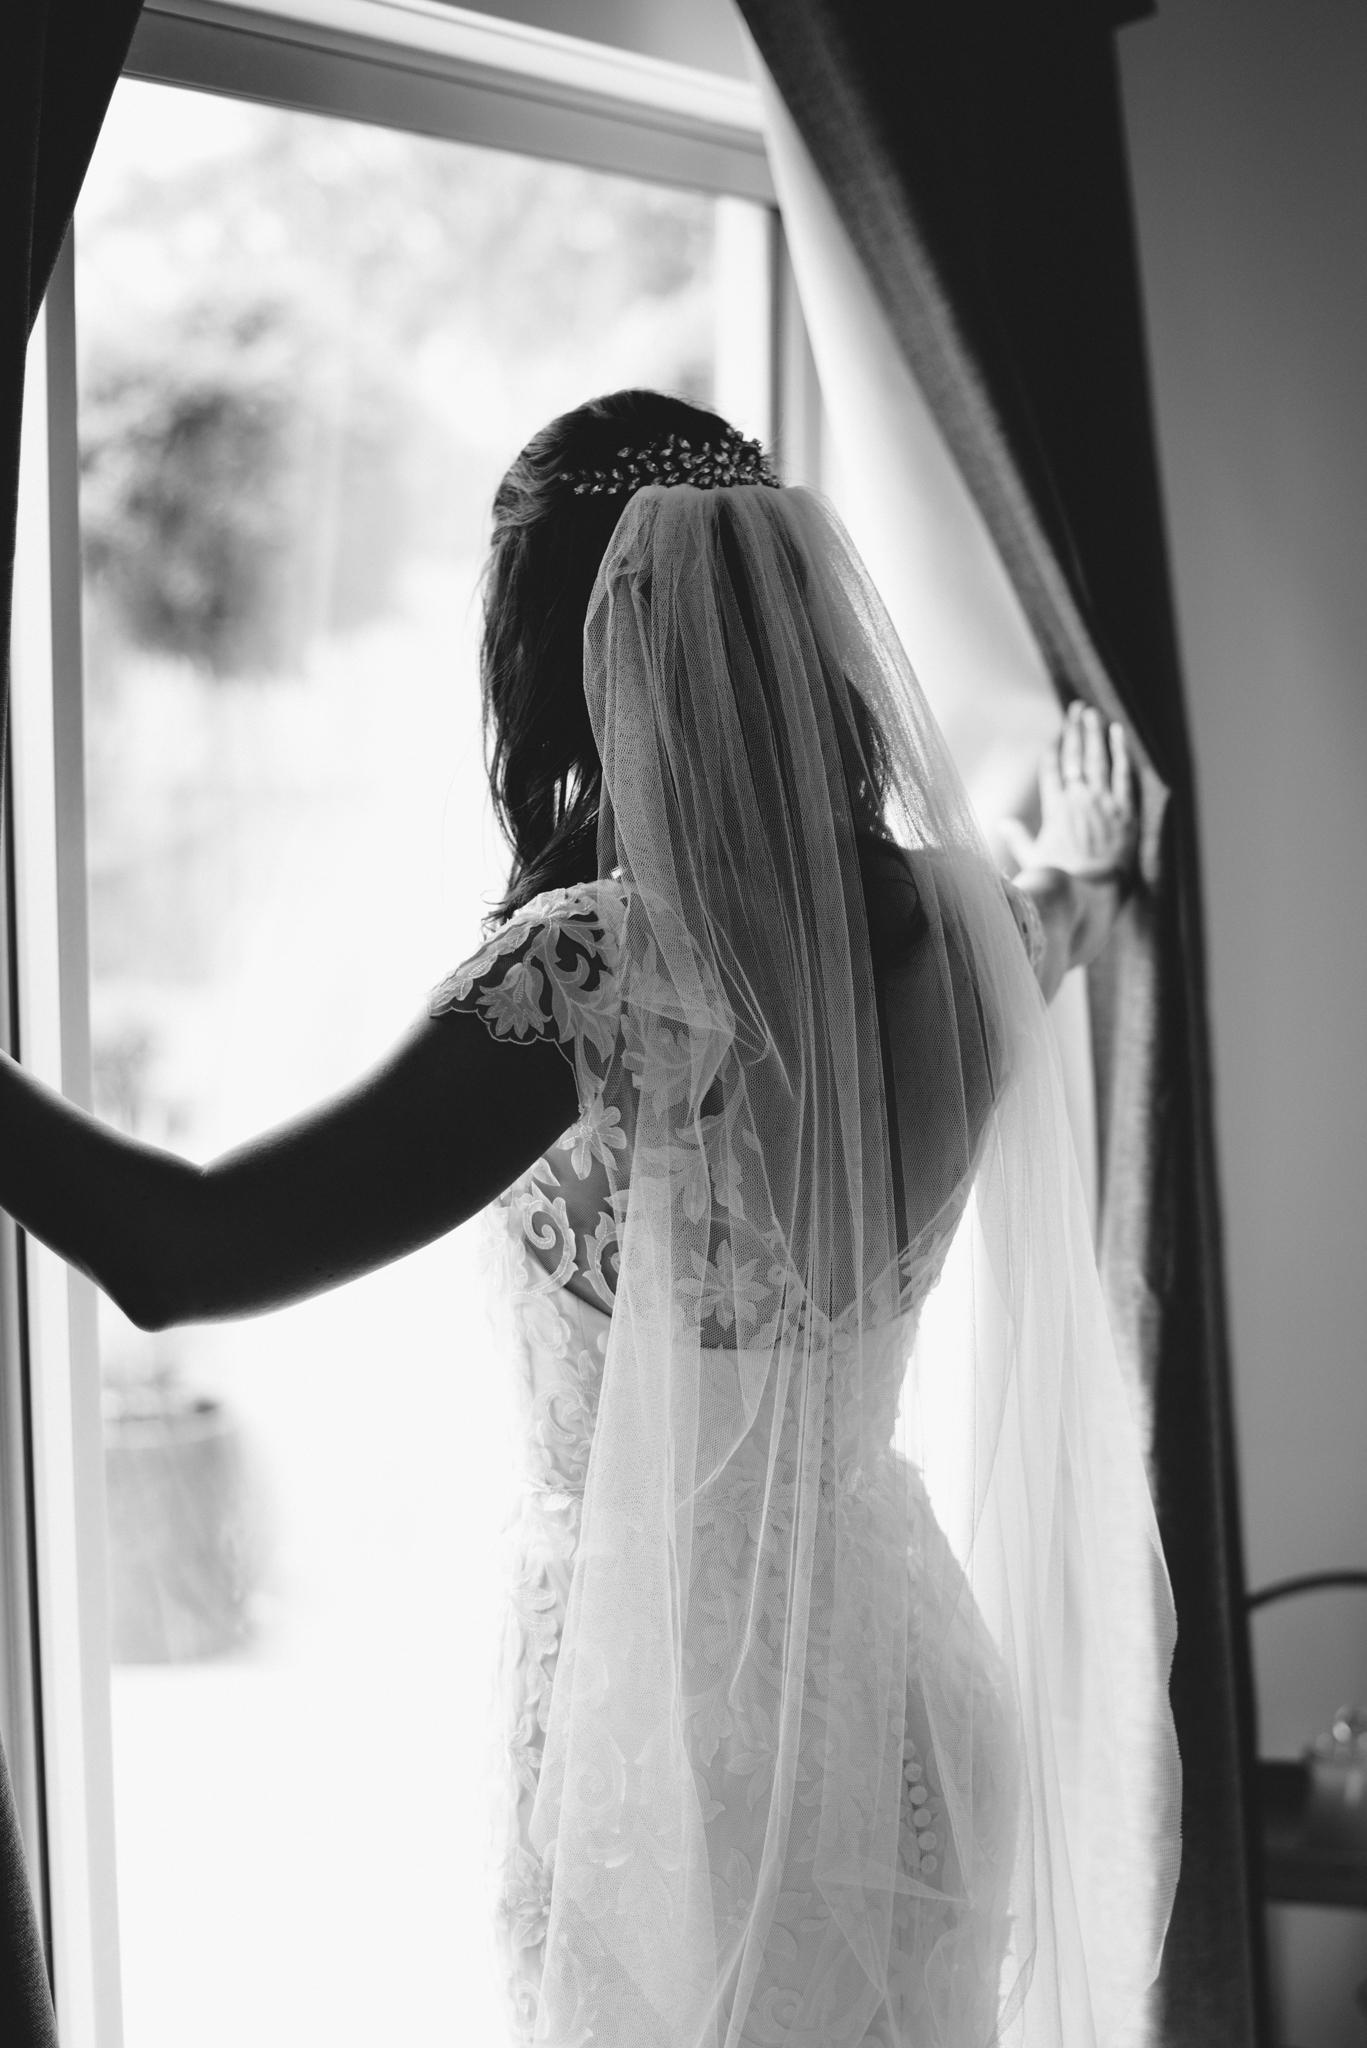 LOVELENSCAPES PHOTOGRAPHY • VISUAL POETRY • NEW ZEALAND WEDDING PHOTOGRAPHER • AUSTRALIAN WEDDING PHOTOGRAPHER • BRISBANE • MELBOURNE • SYDNEY • HOBART • TARUREKA ESTATE • ANNA CAMPBELL • 43.jpg